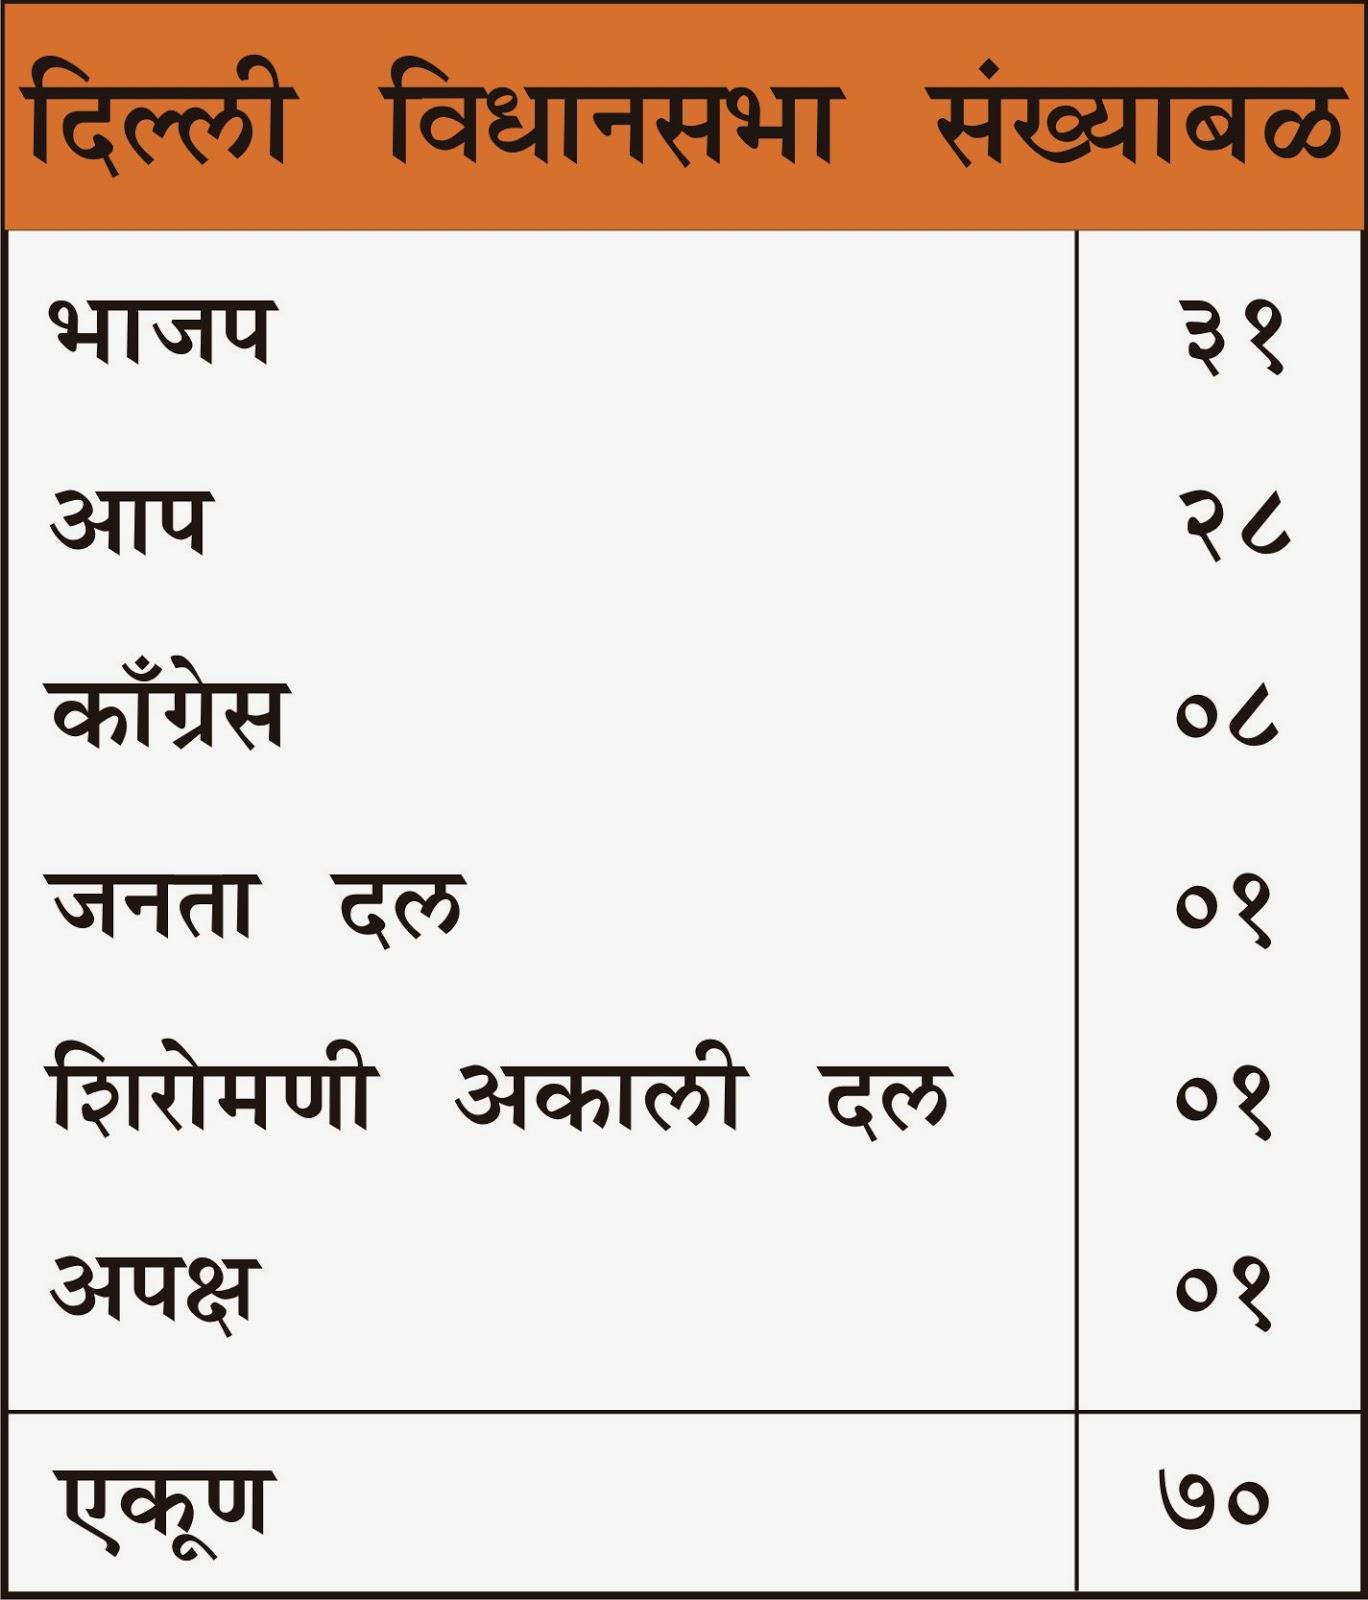 Delhi Election Results 2013